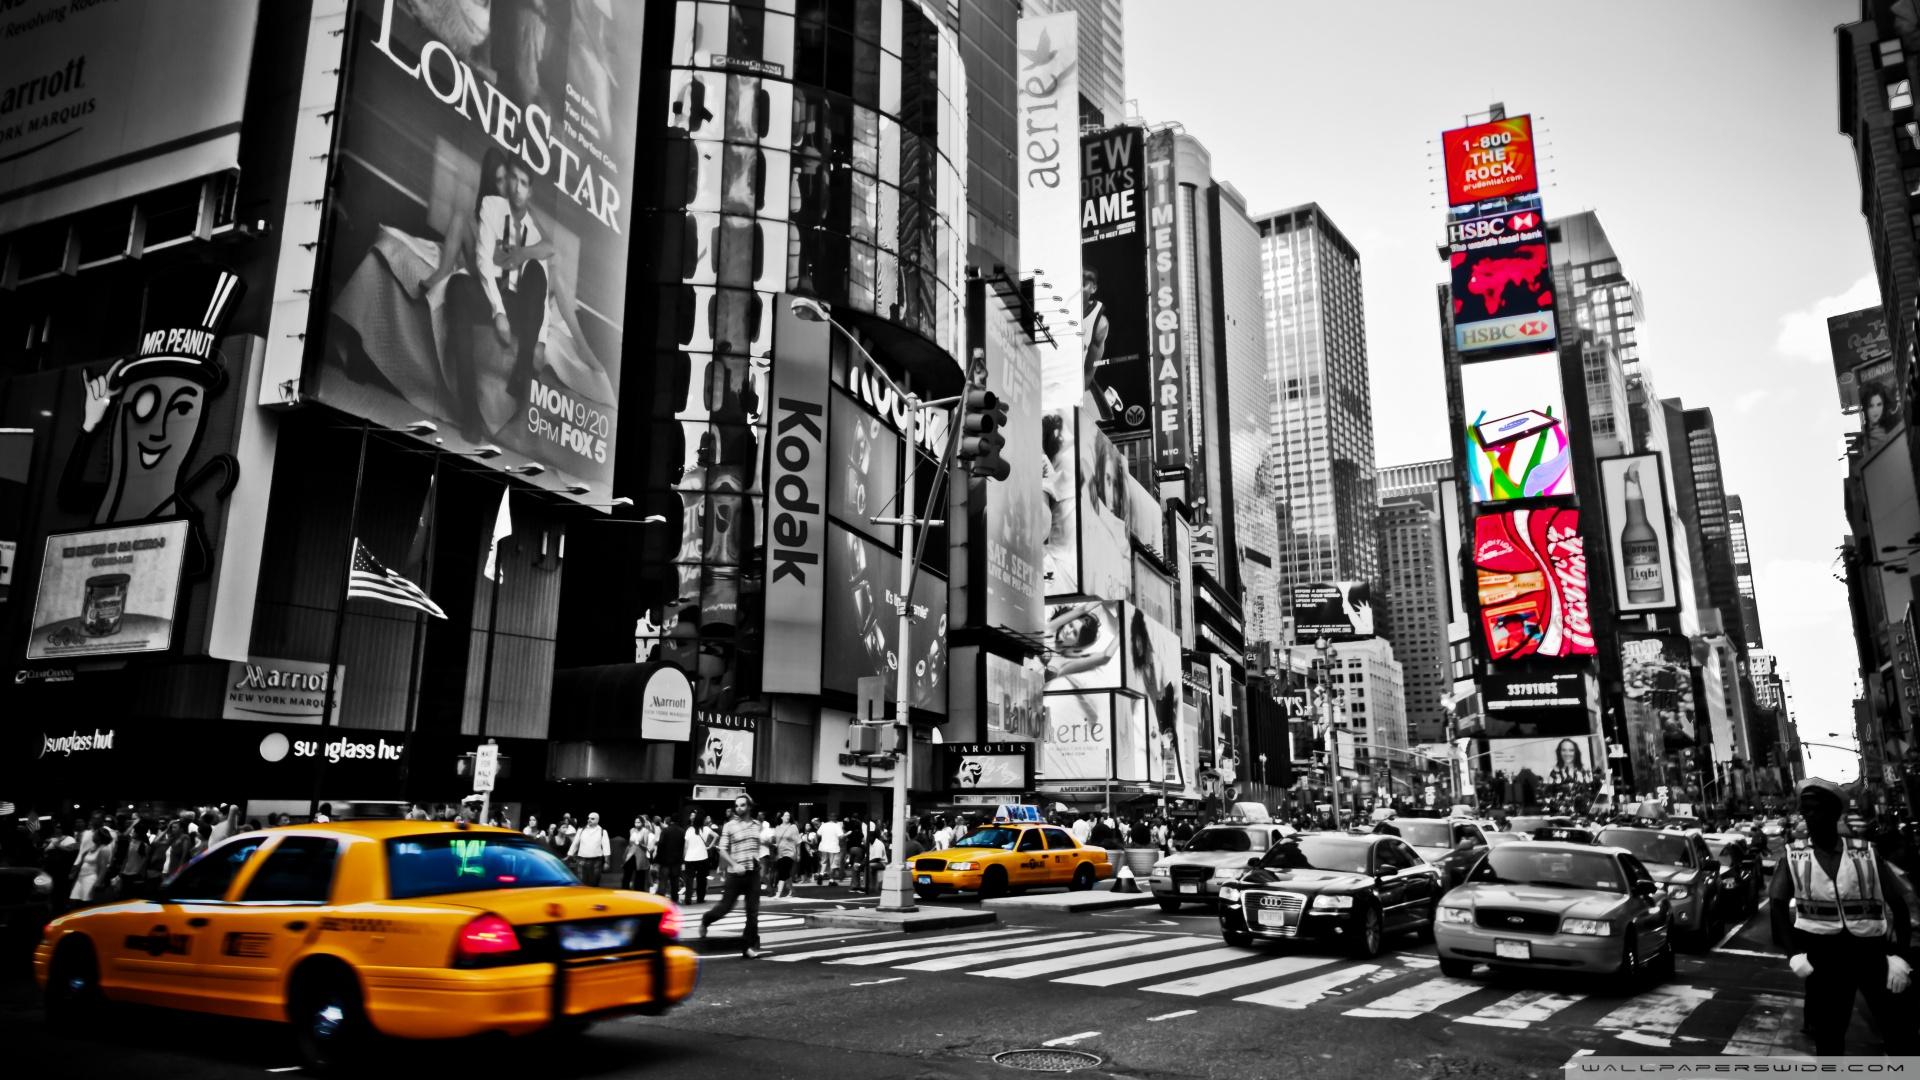 Wallpaper City wallpaper wallpaper free download